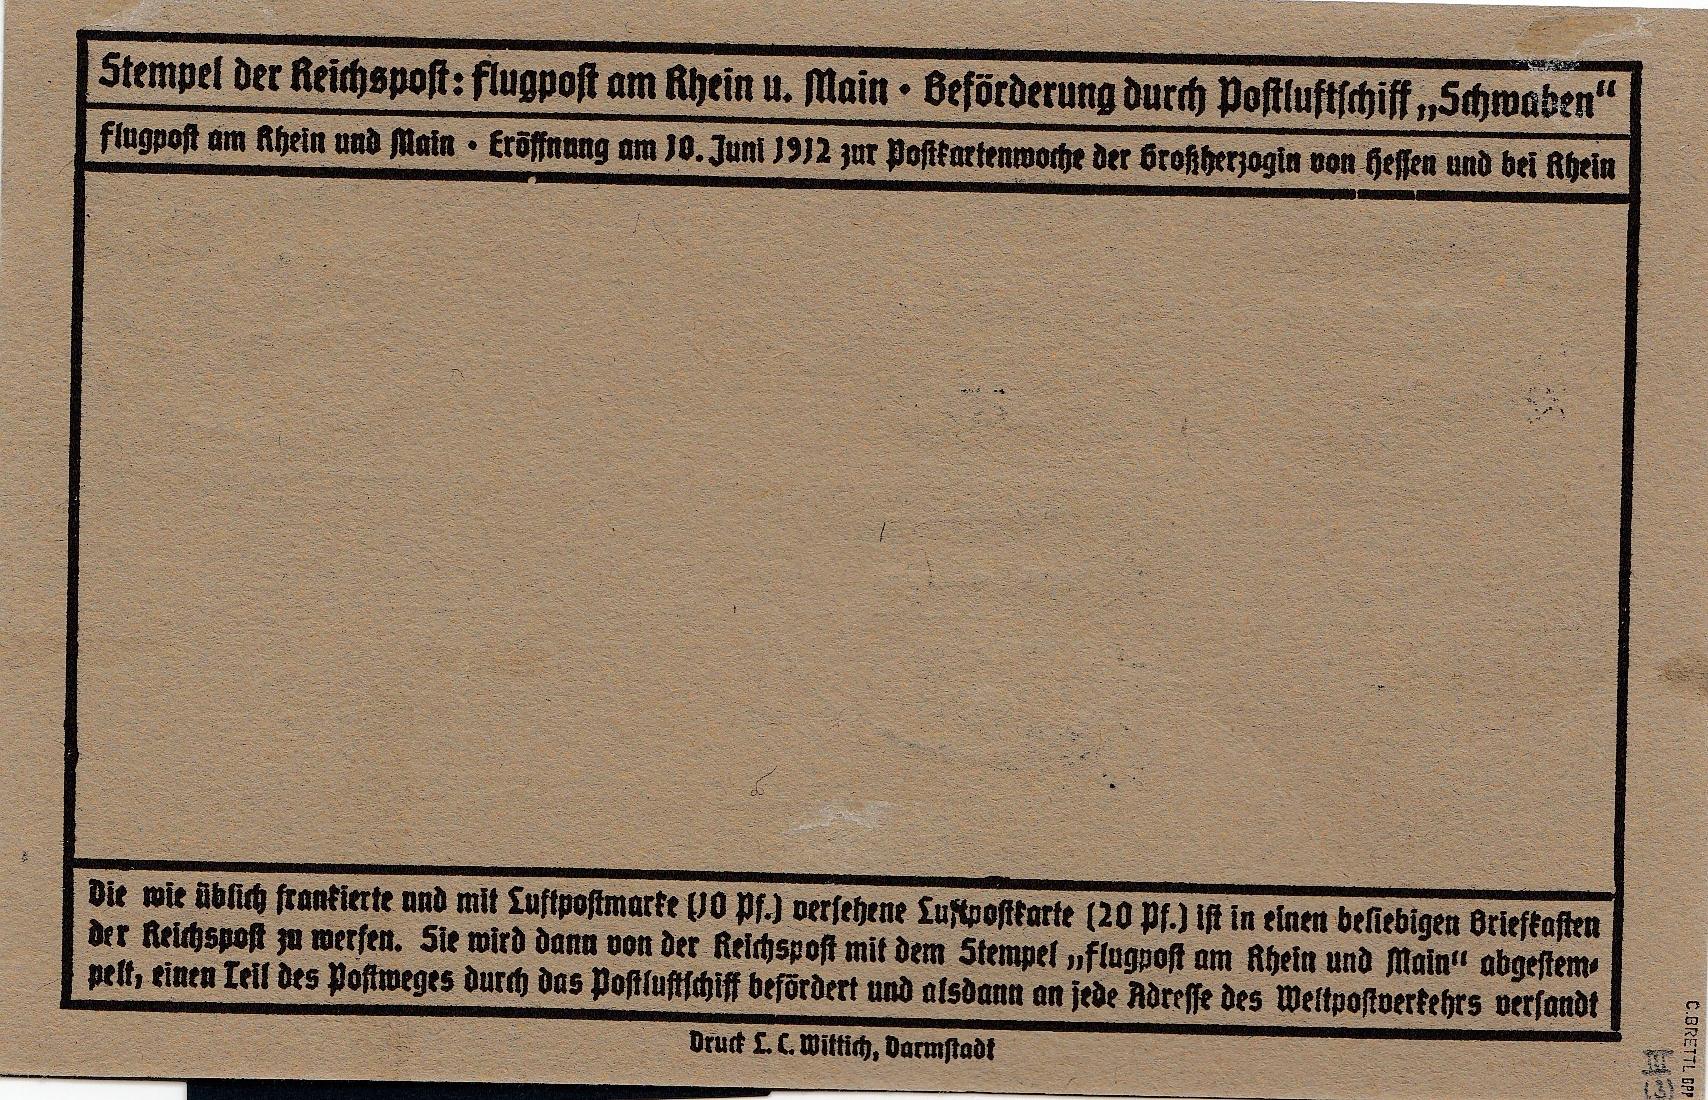 flug post karte minr iii echt einwandfrei flugpost rhein main selten sign philarena. Black Bedroom Furniture Sets. Home Design Ideas